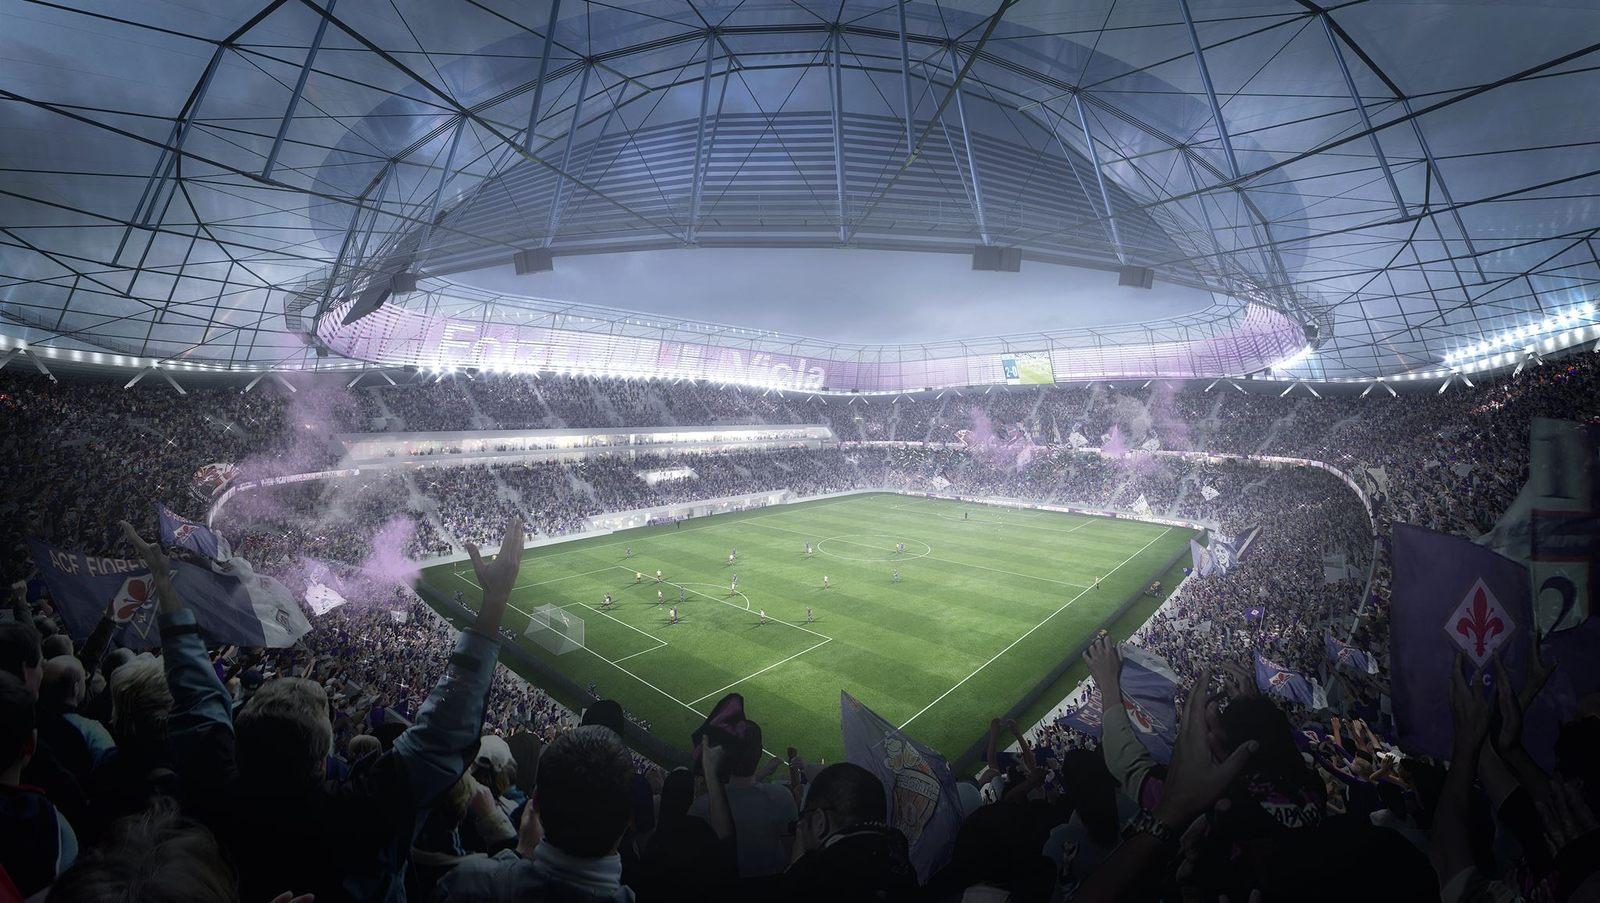 Estadio della Fiorentina